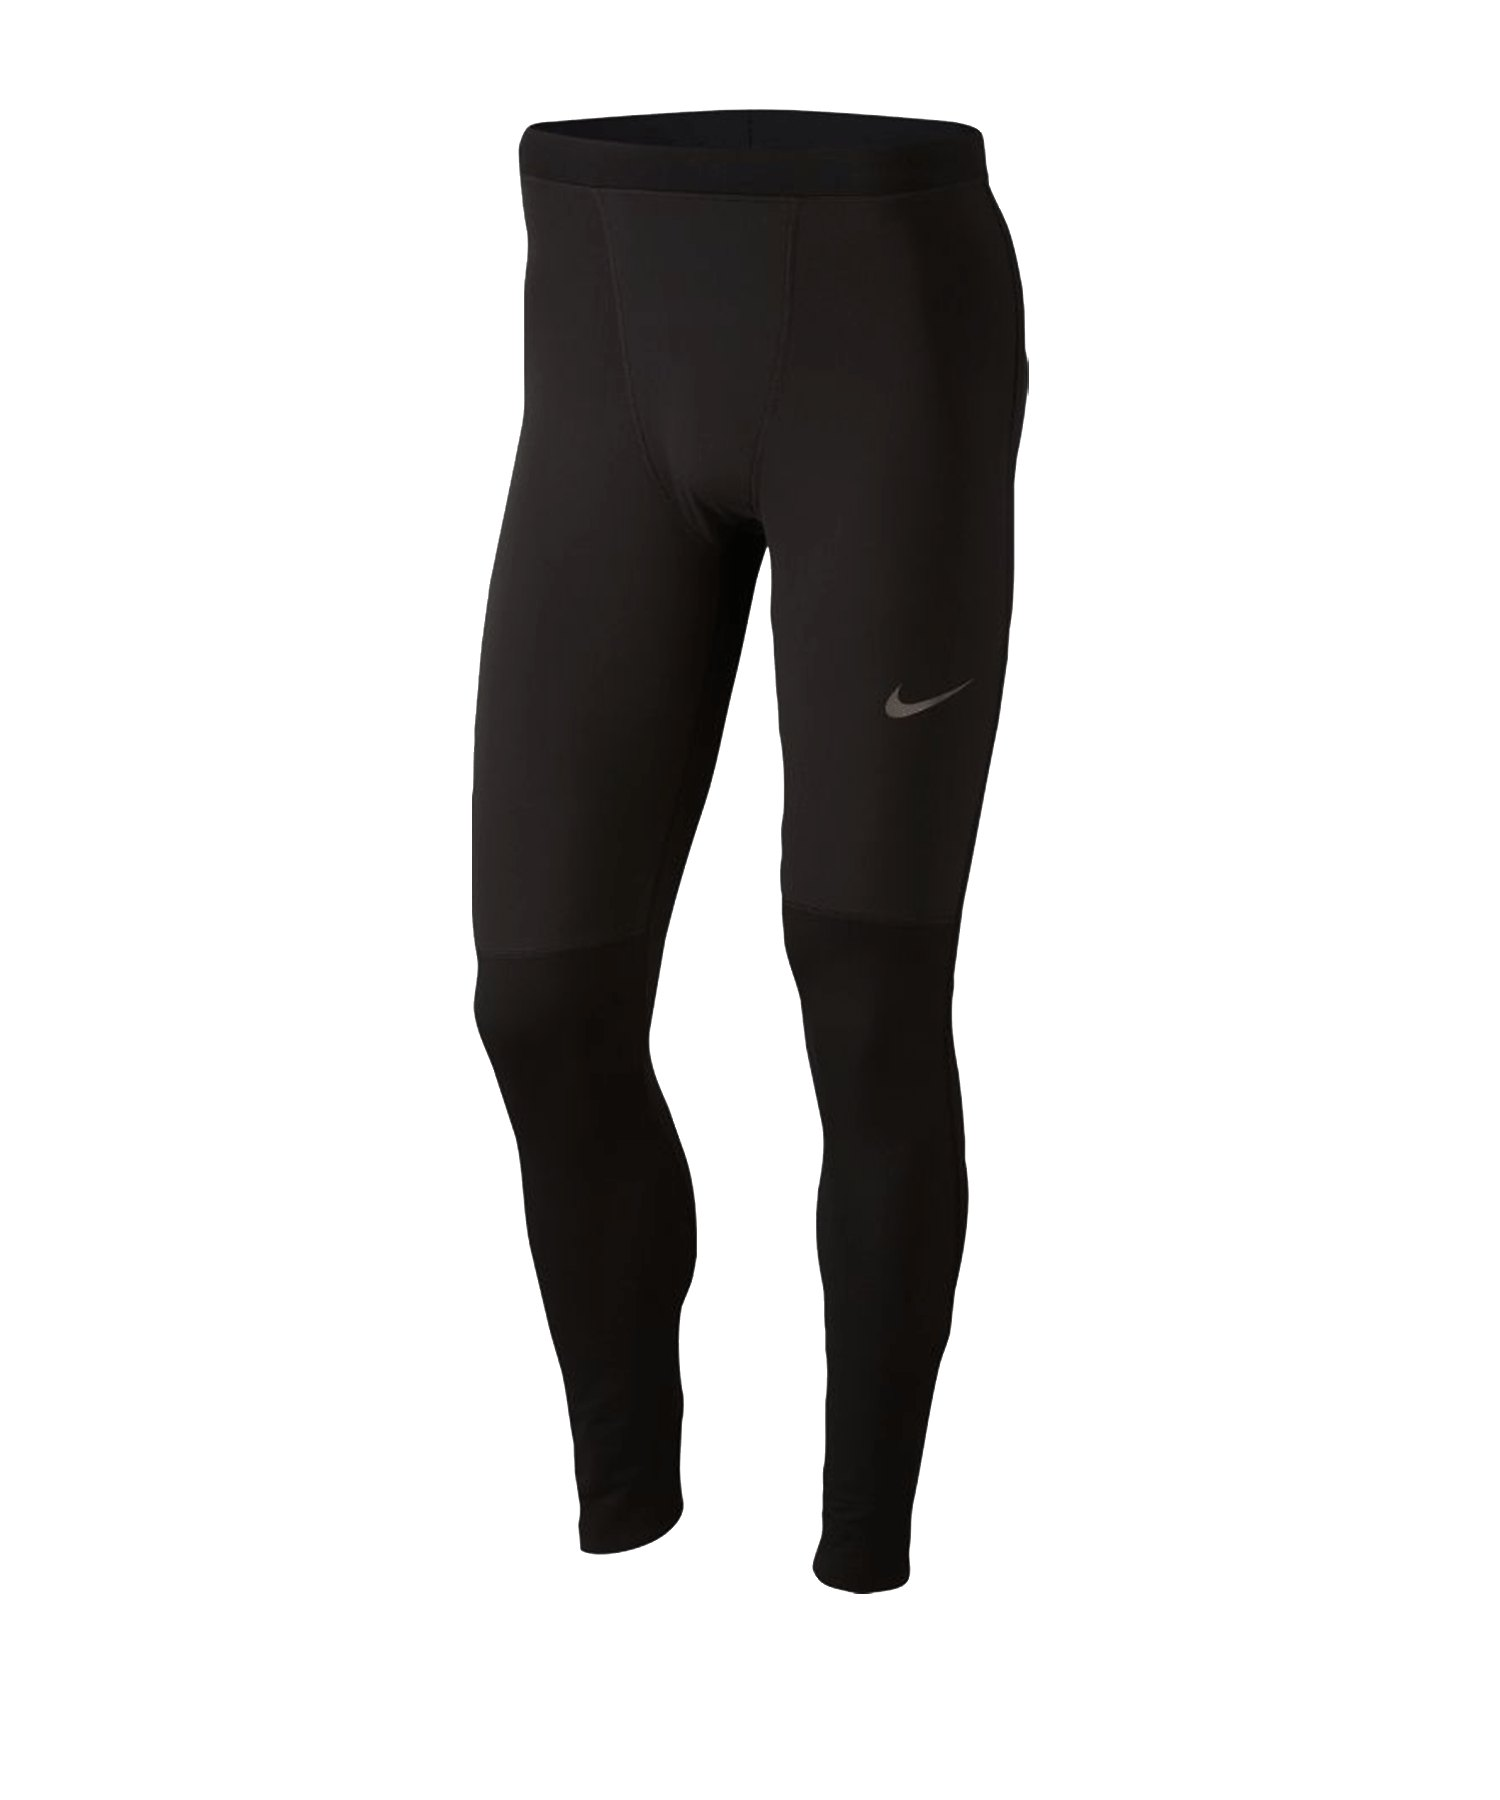 Nike Therma Repel Tight lang Schwarz F010 - schwarz